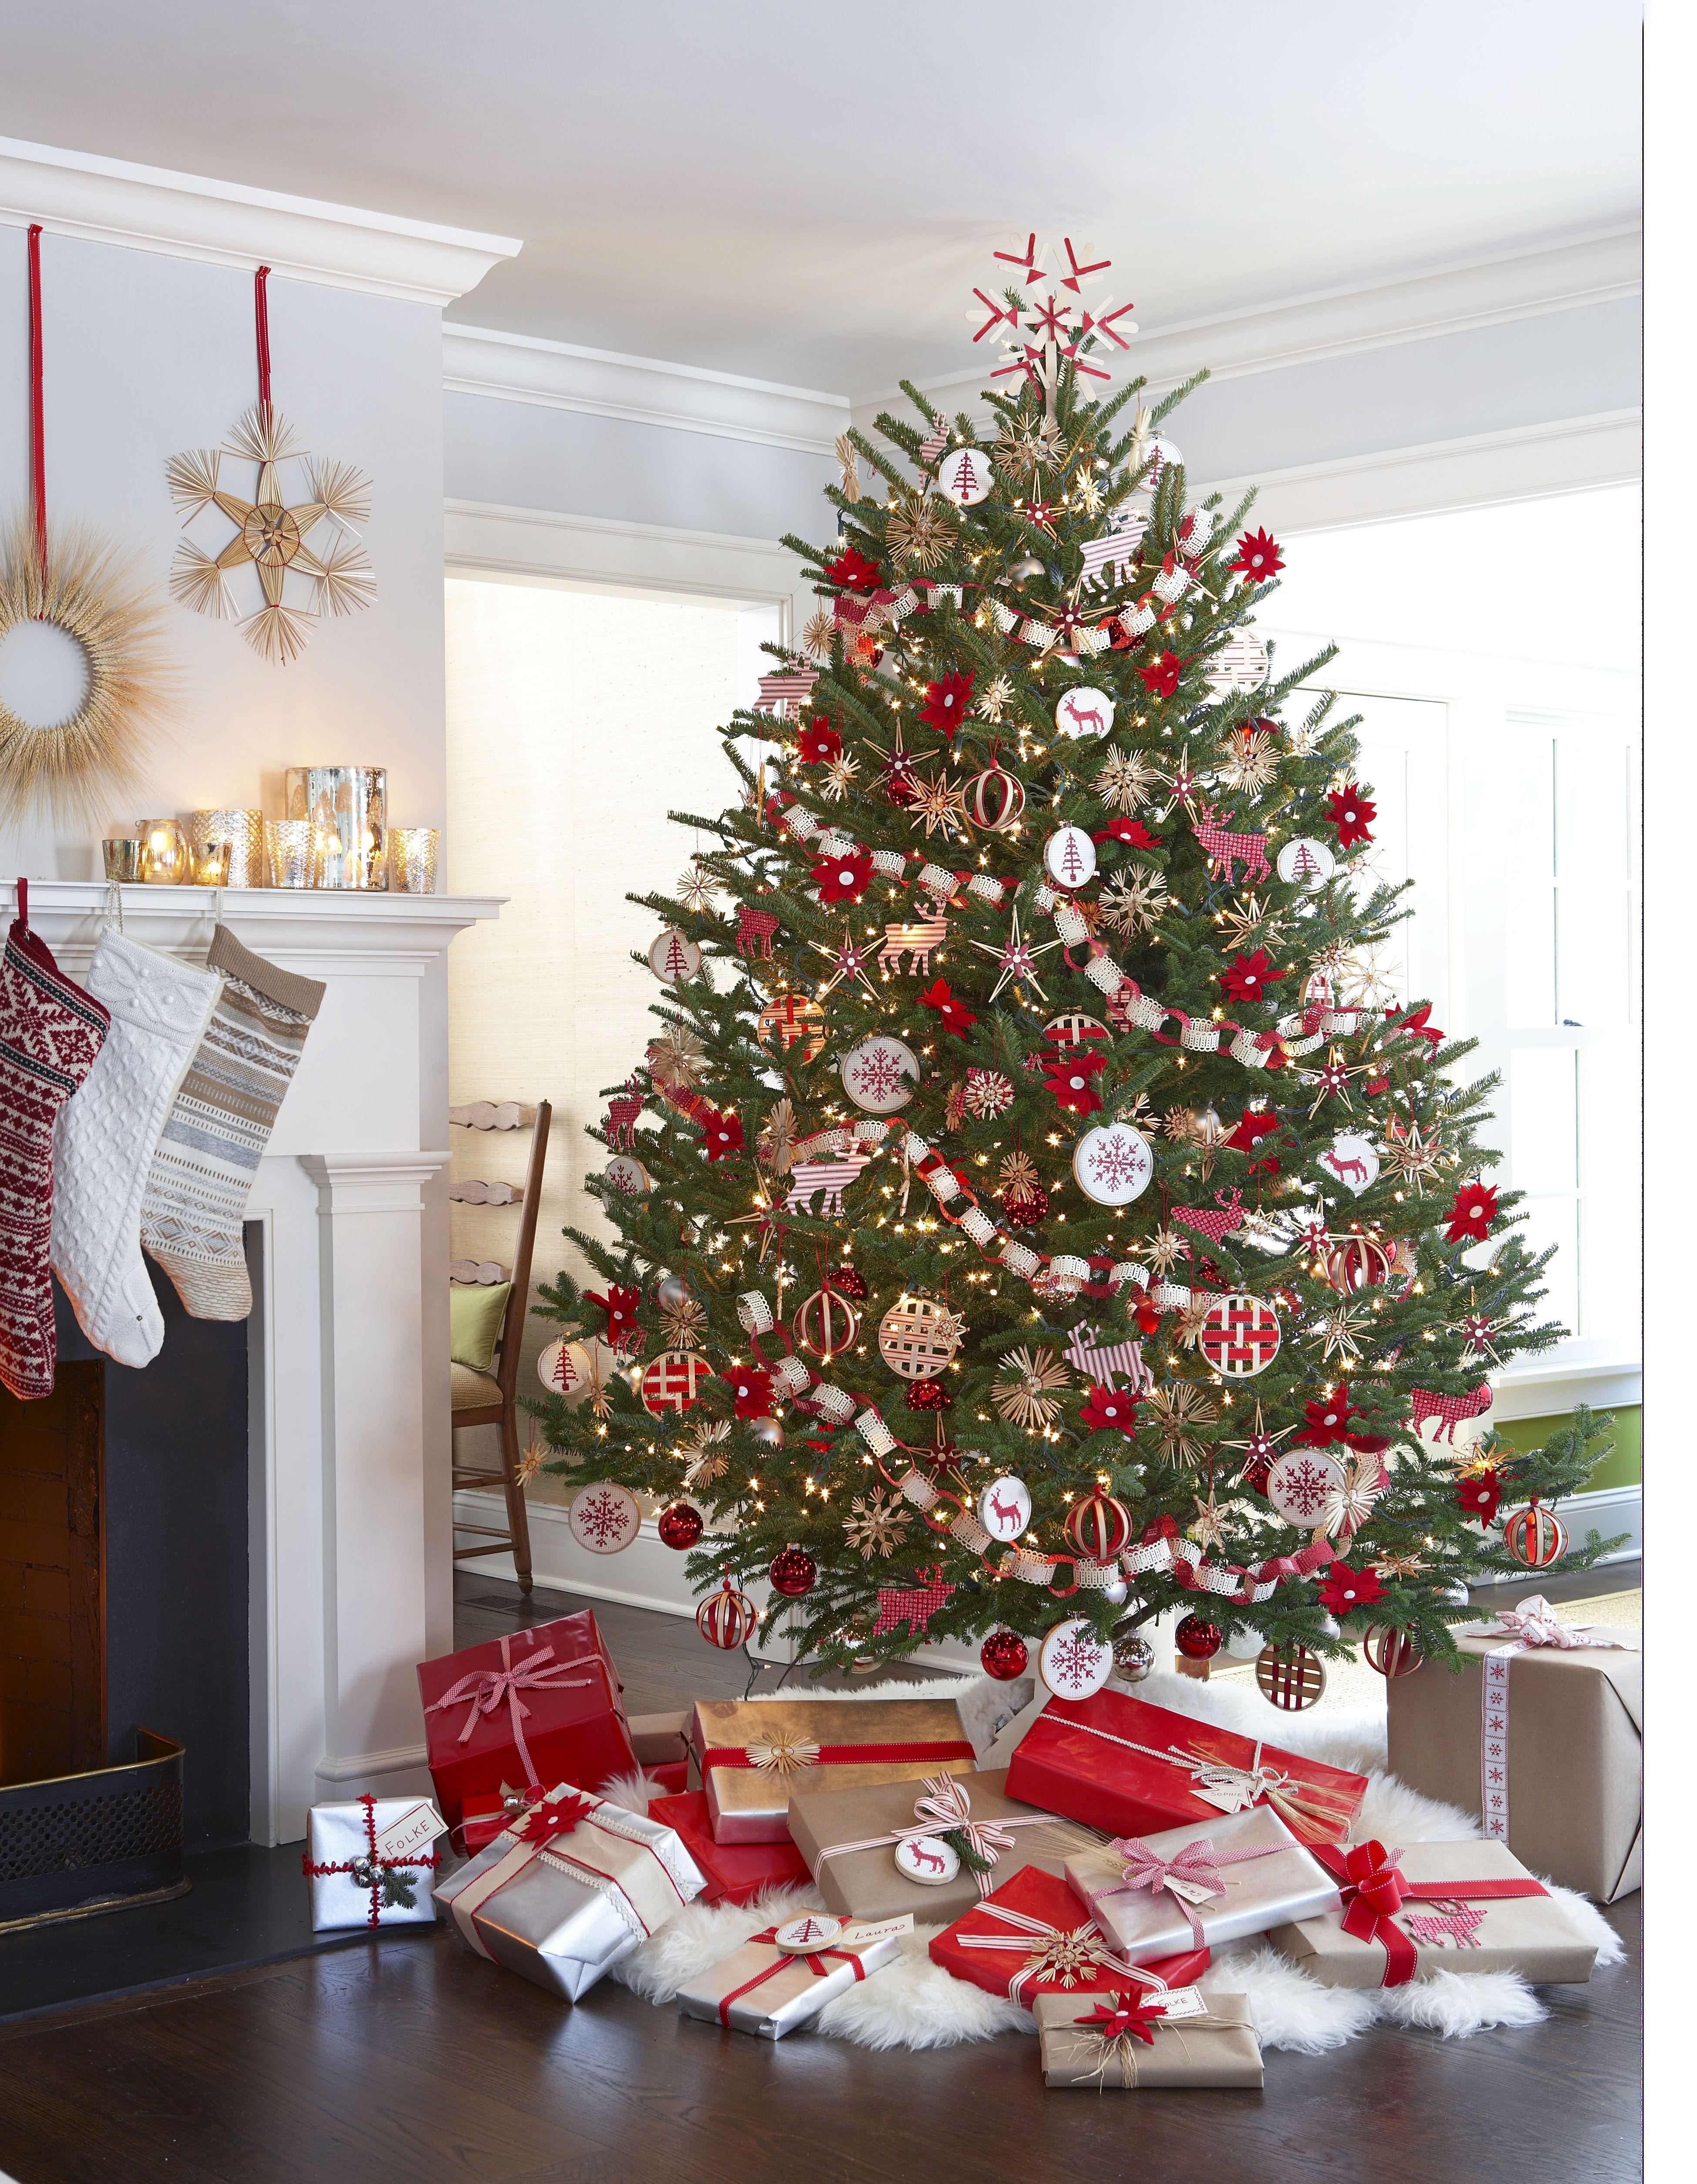 10 Scandinavian Inspired Christmas Decorating Ideas Scandinavian Christmas Trees Christmas Tree Design Swedish Christmas Decorations